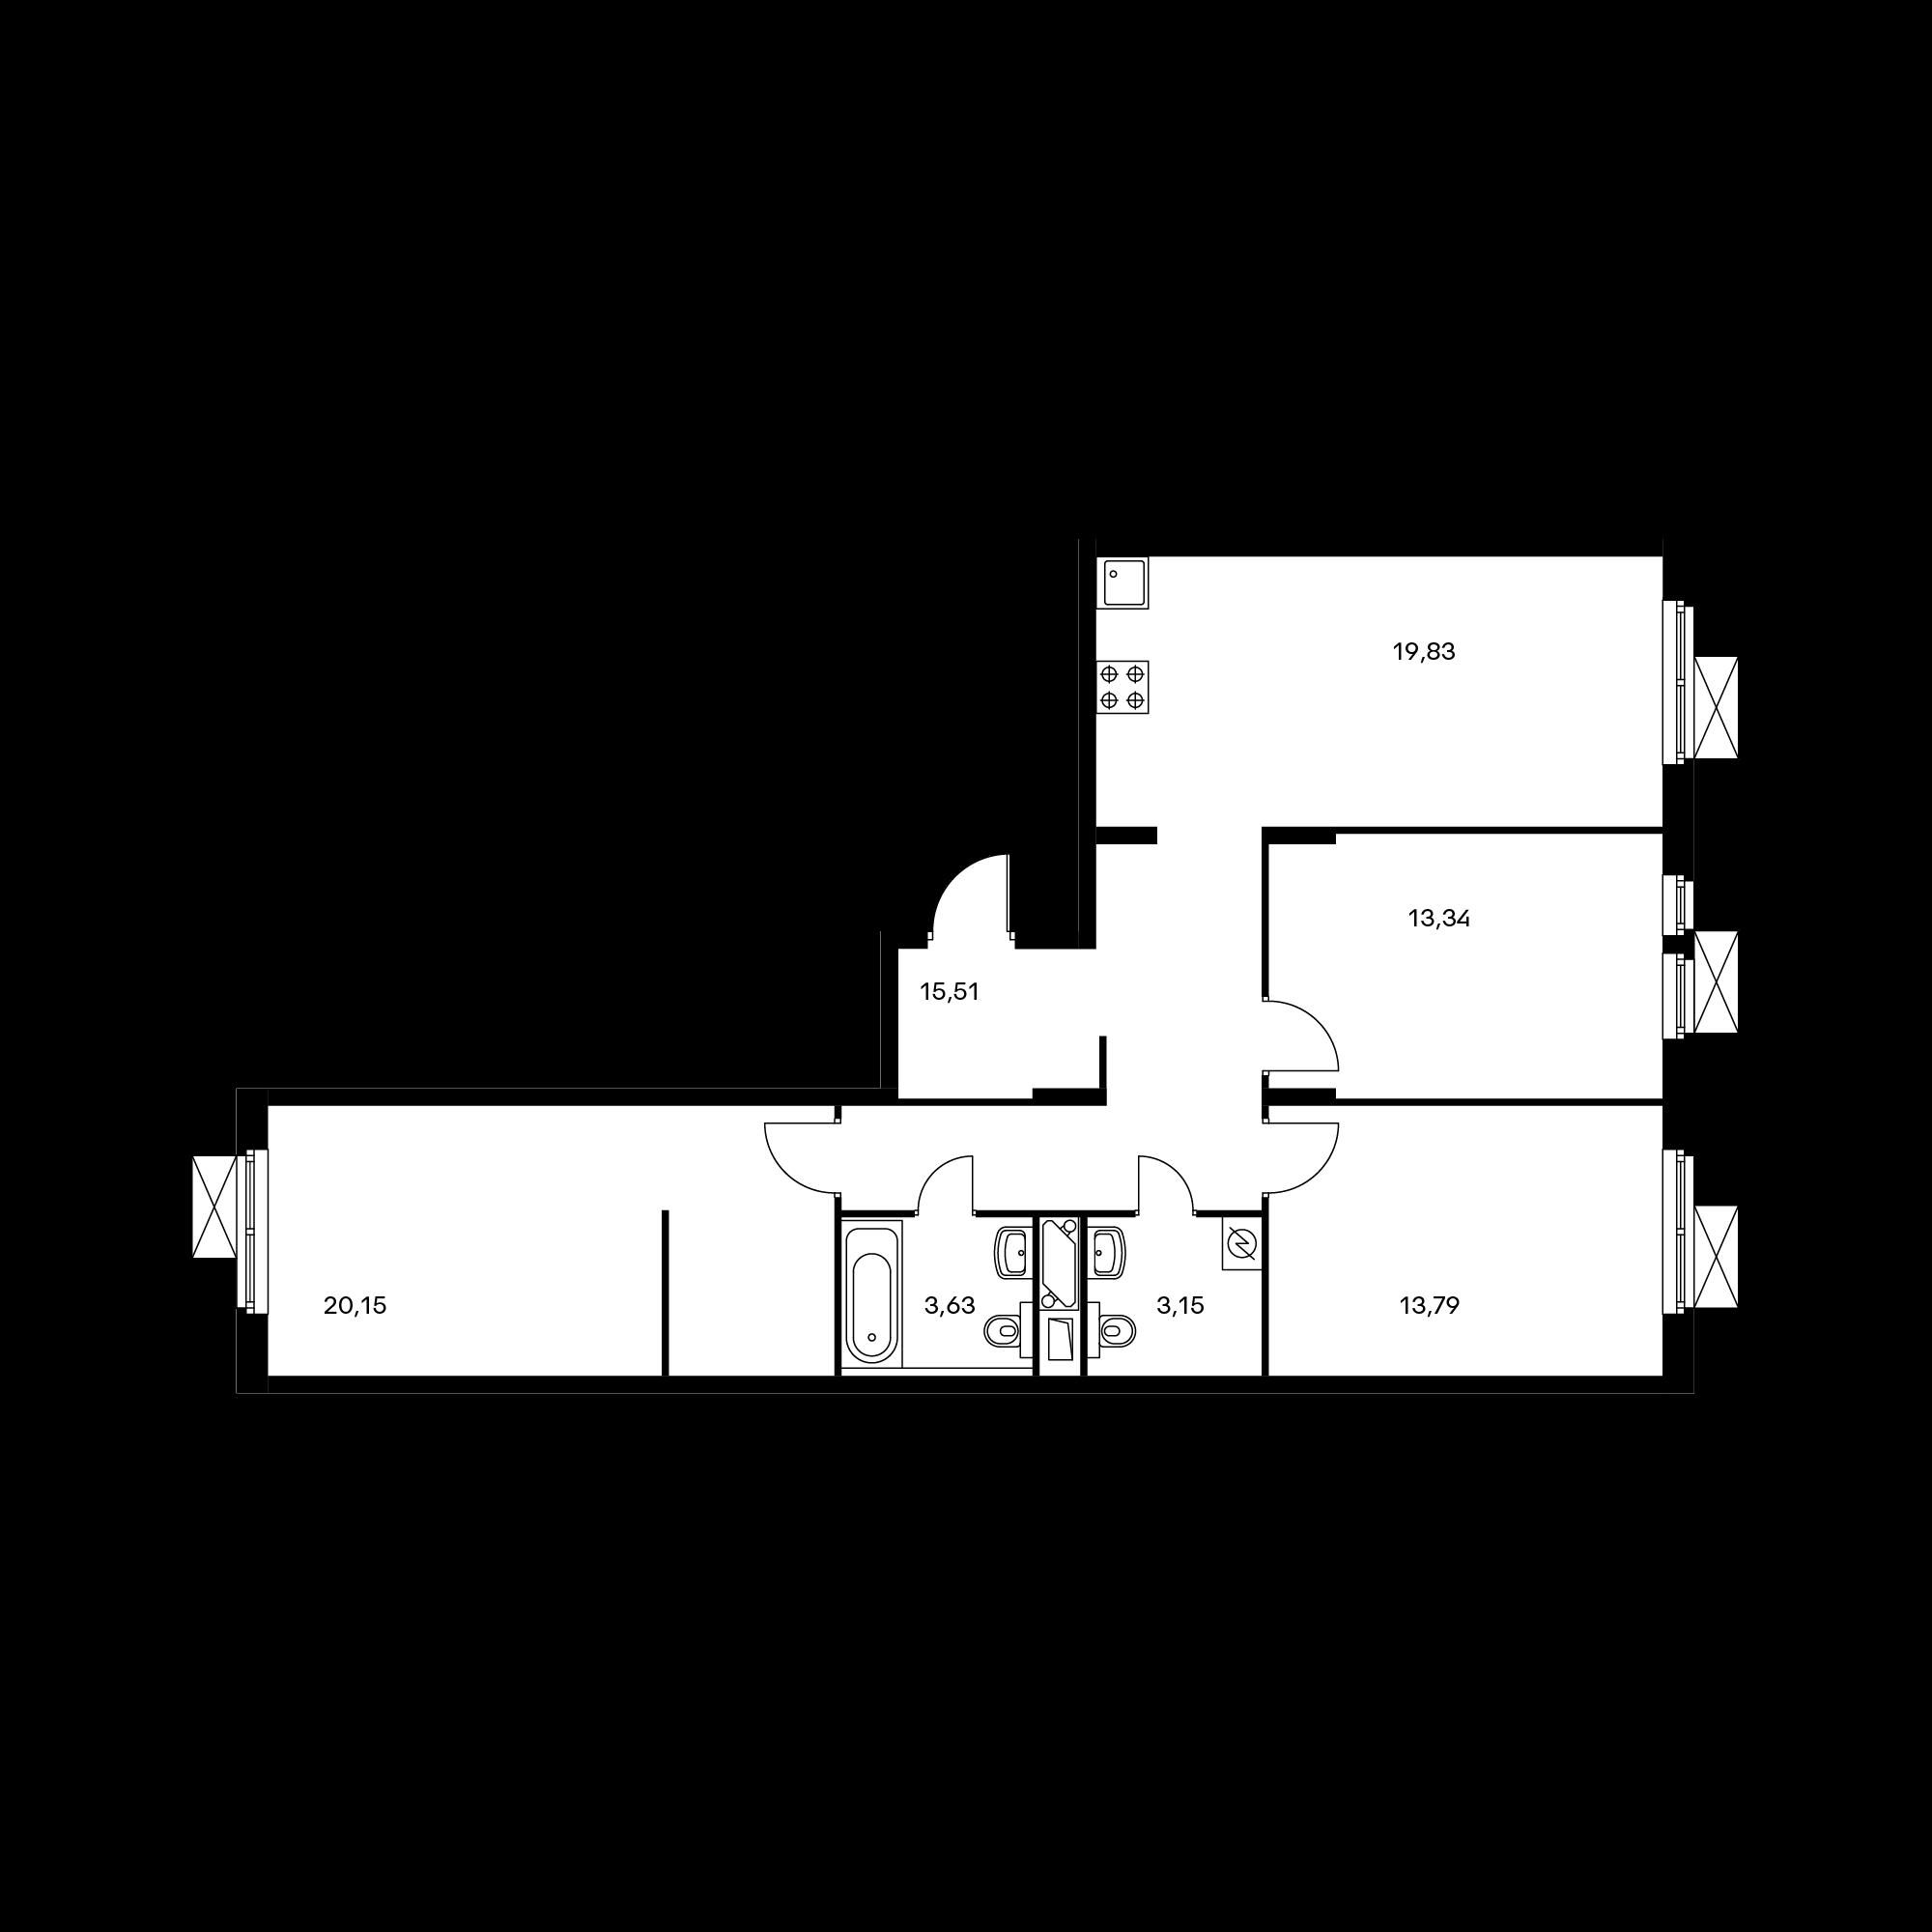 3EL1_9.6